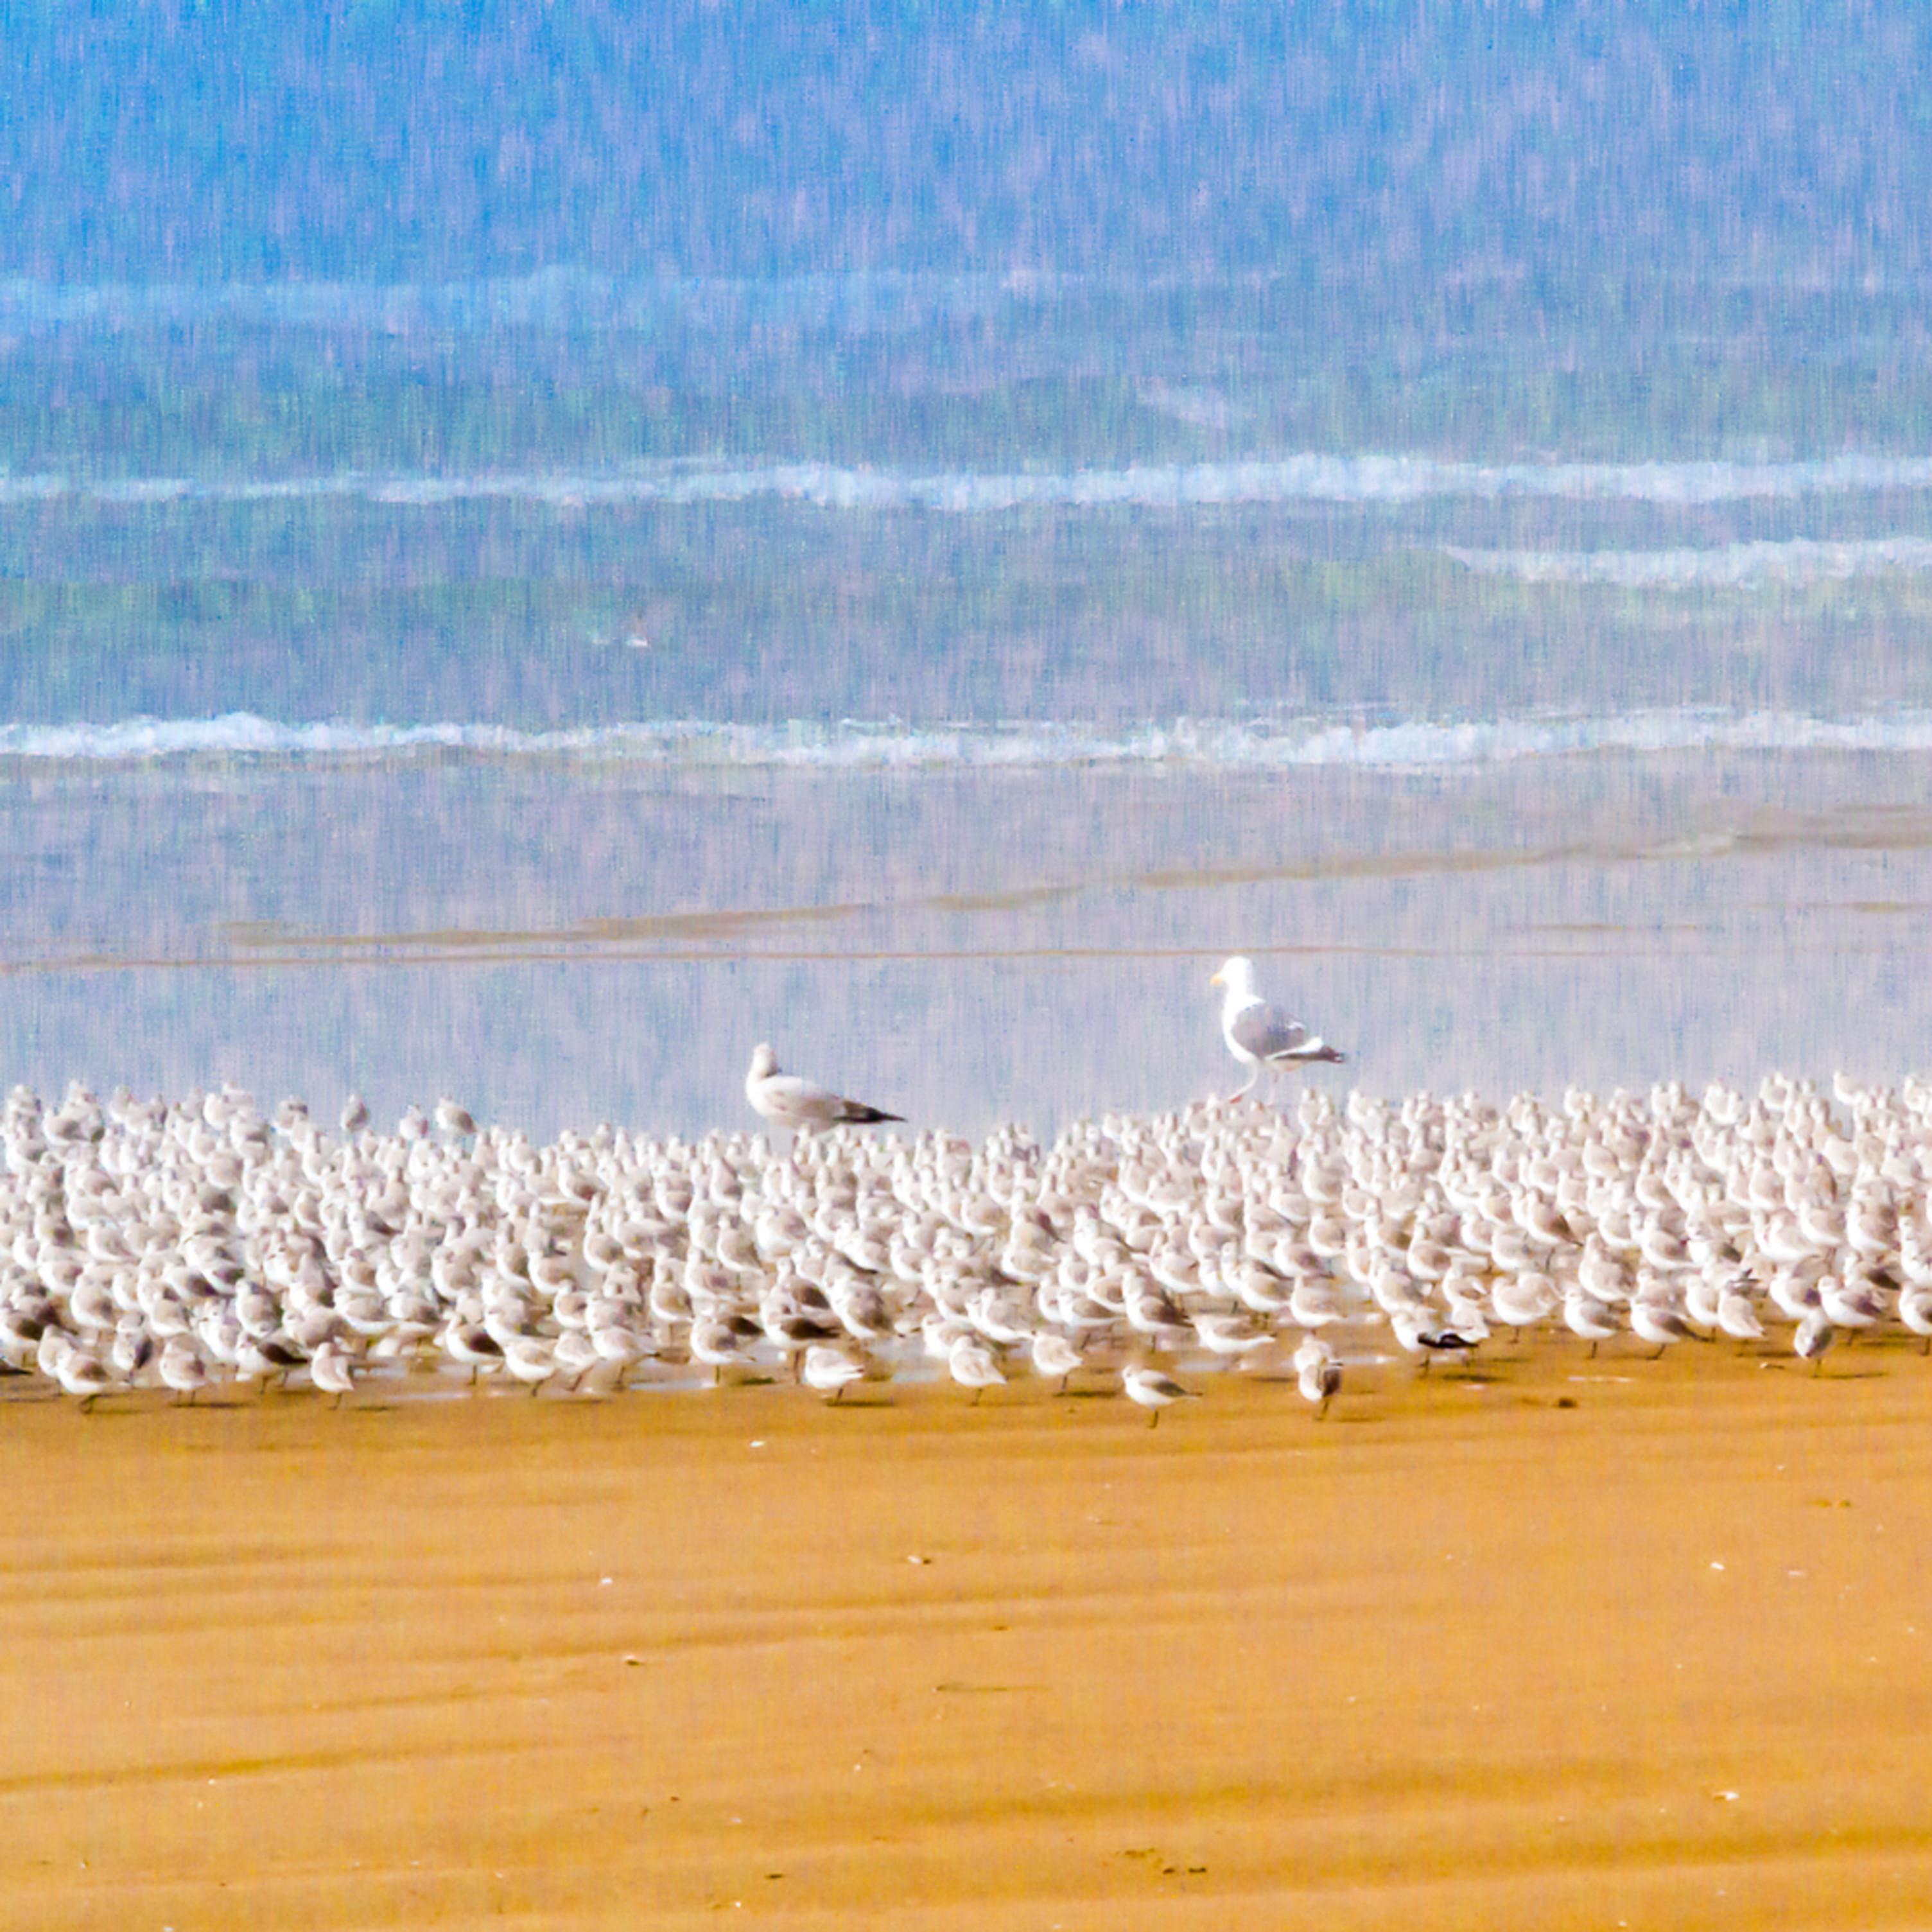 Sandpiperparade pd164s